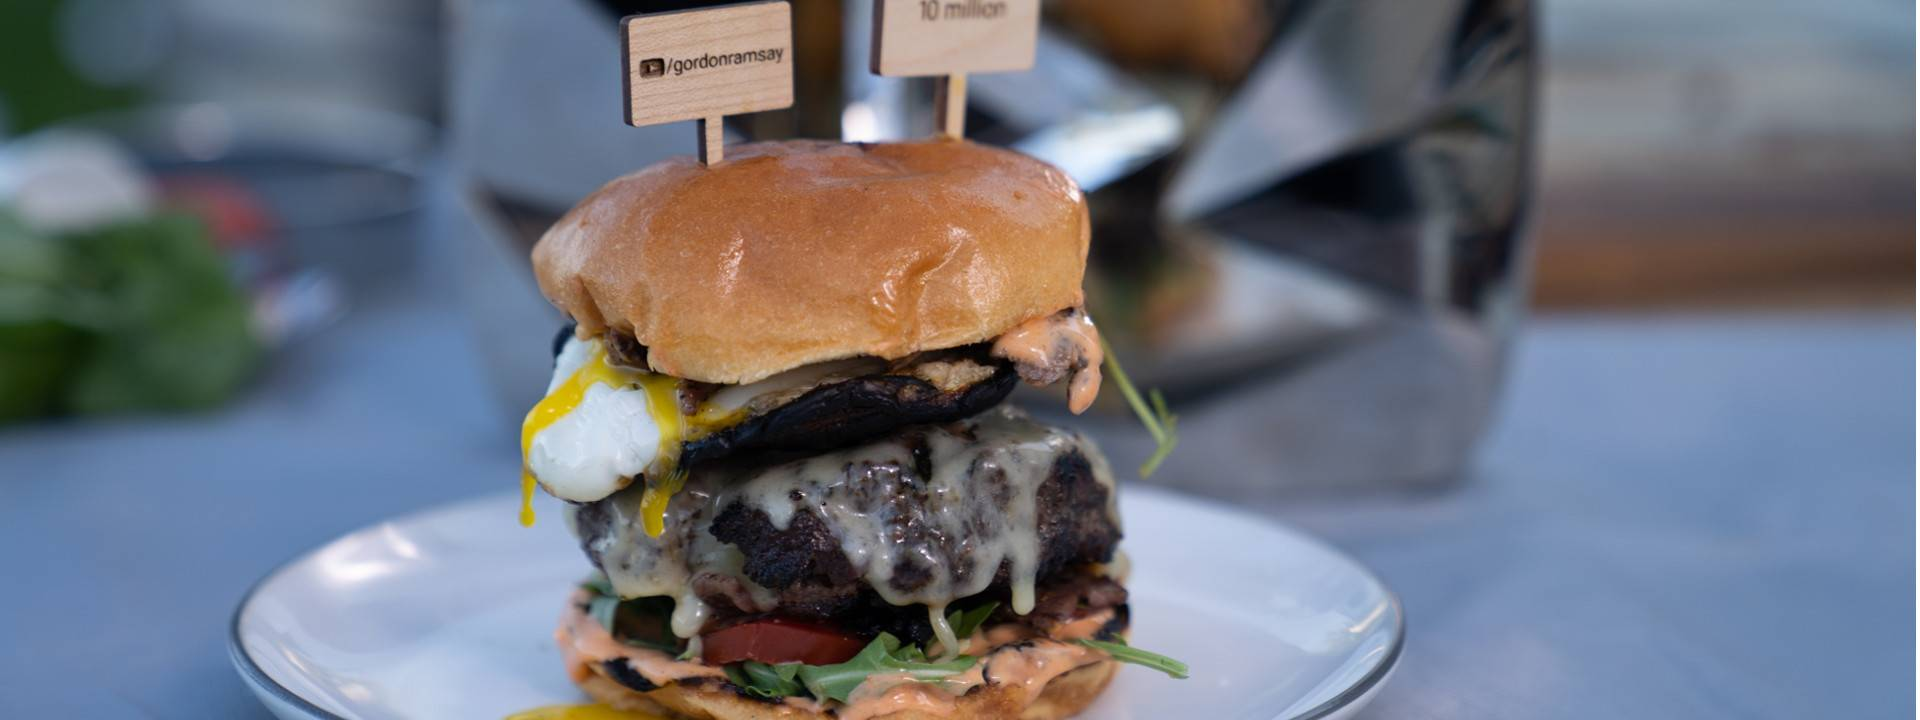 Gordon Ramsay Celebration Burger Recipe 10 Million Subscribers